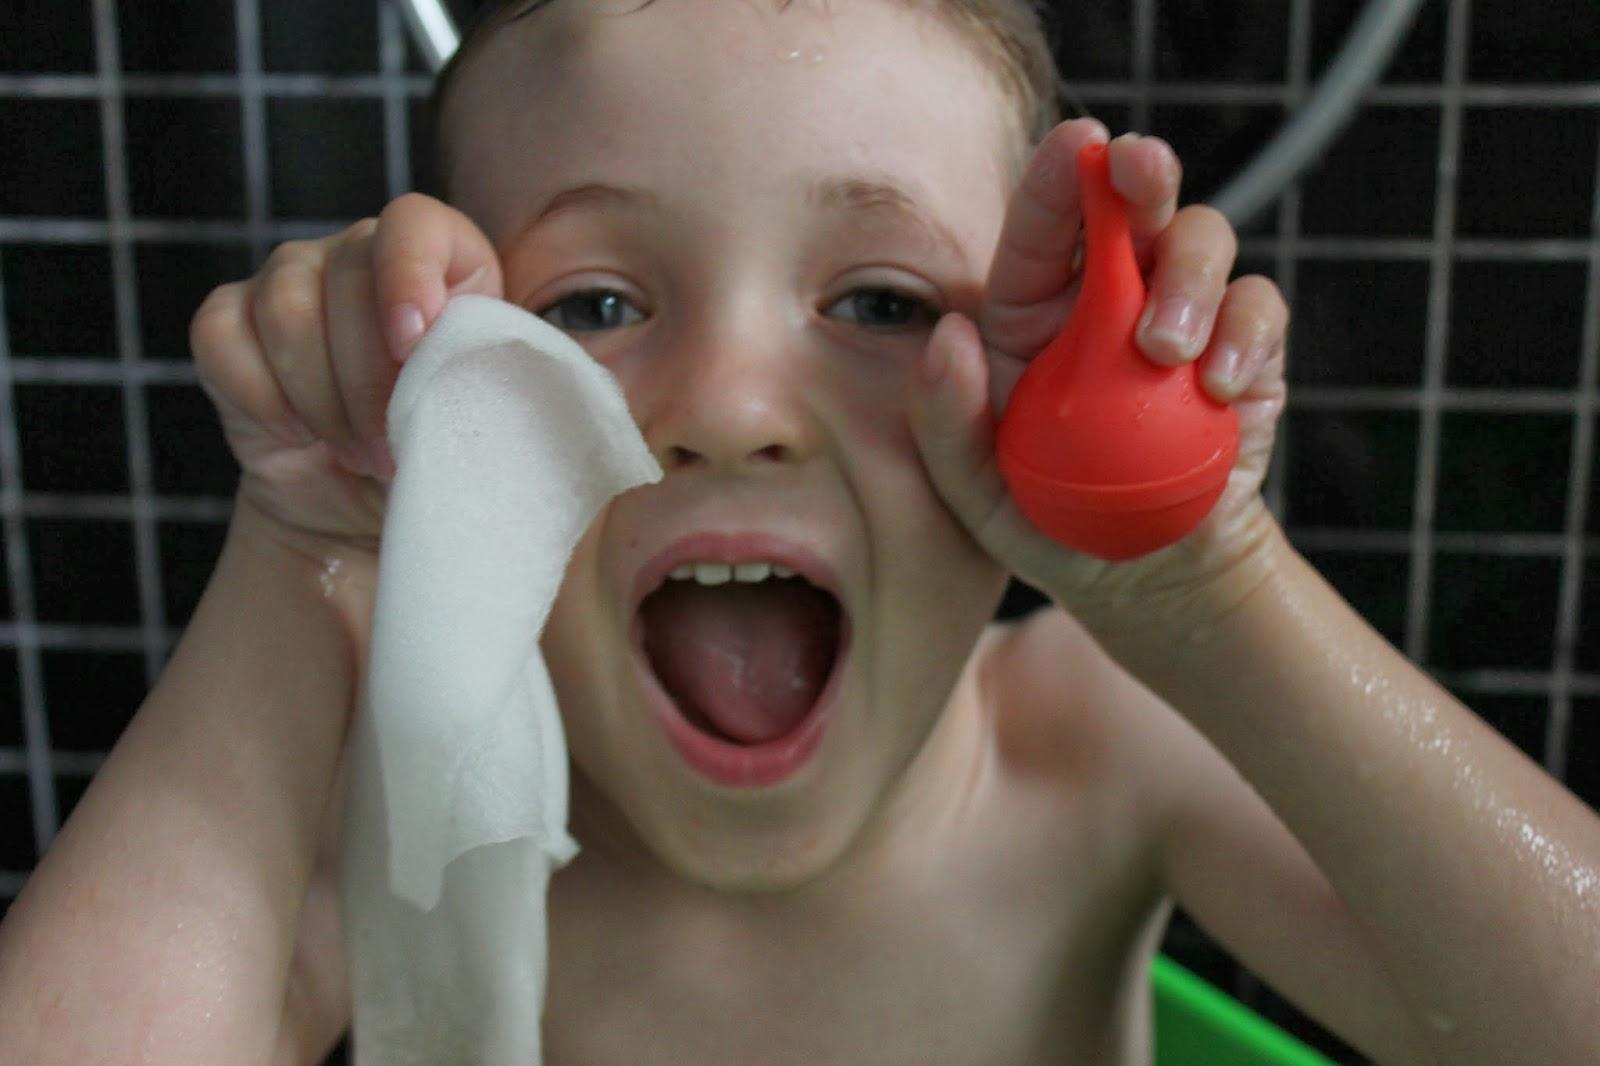 Min kusine maria: alternativ boble leg i badekaret